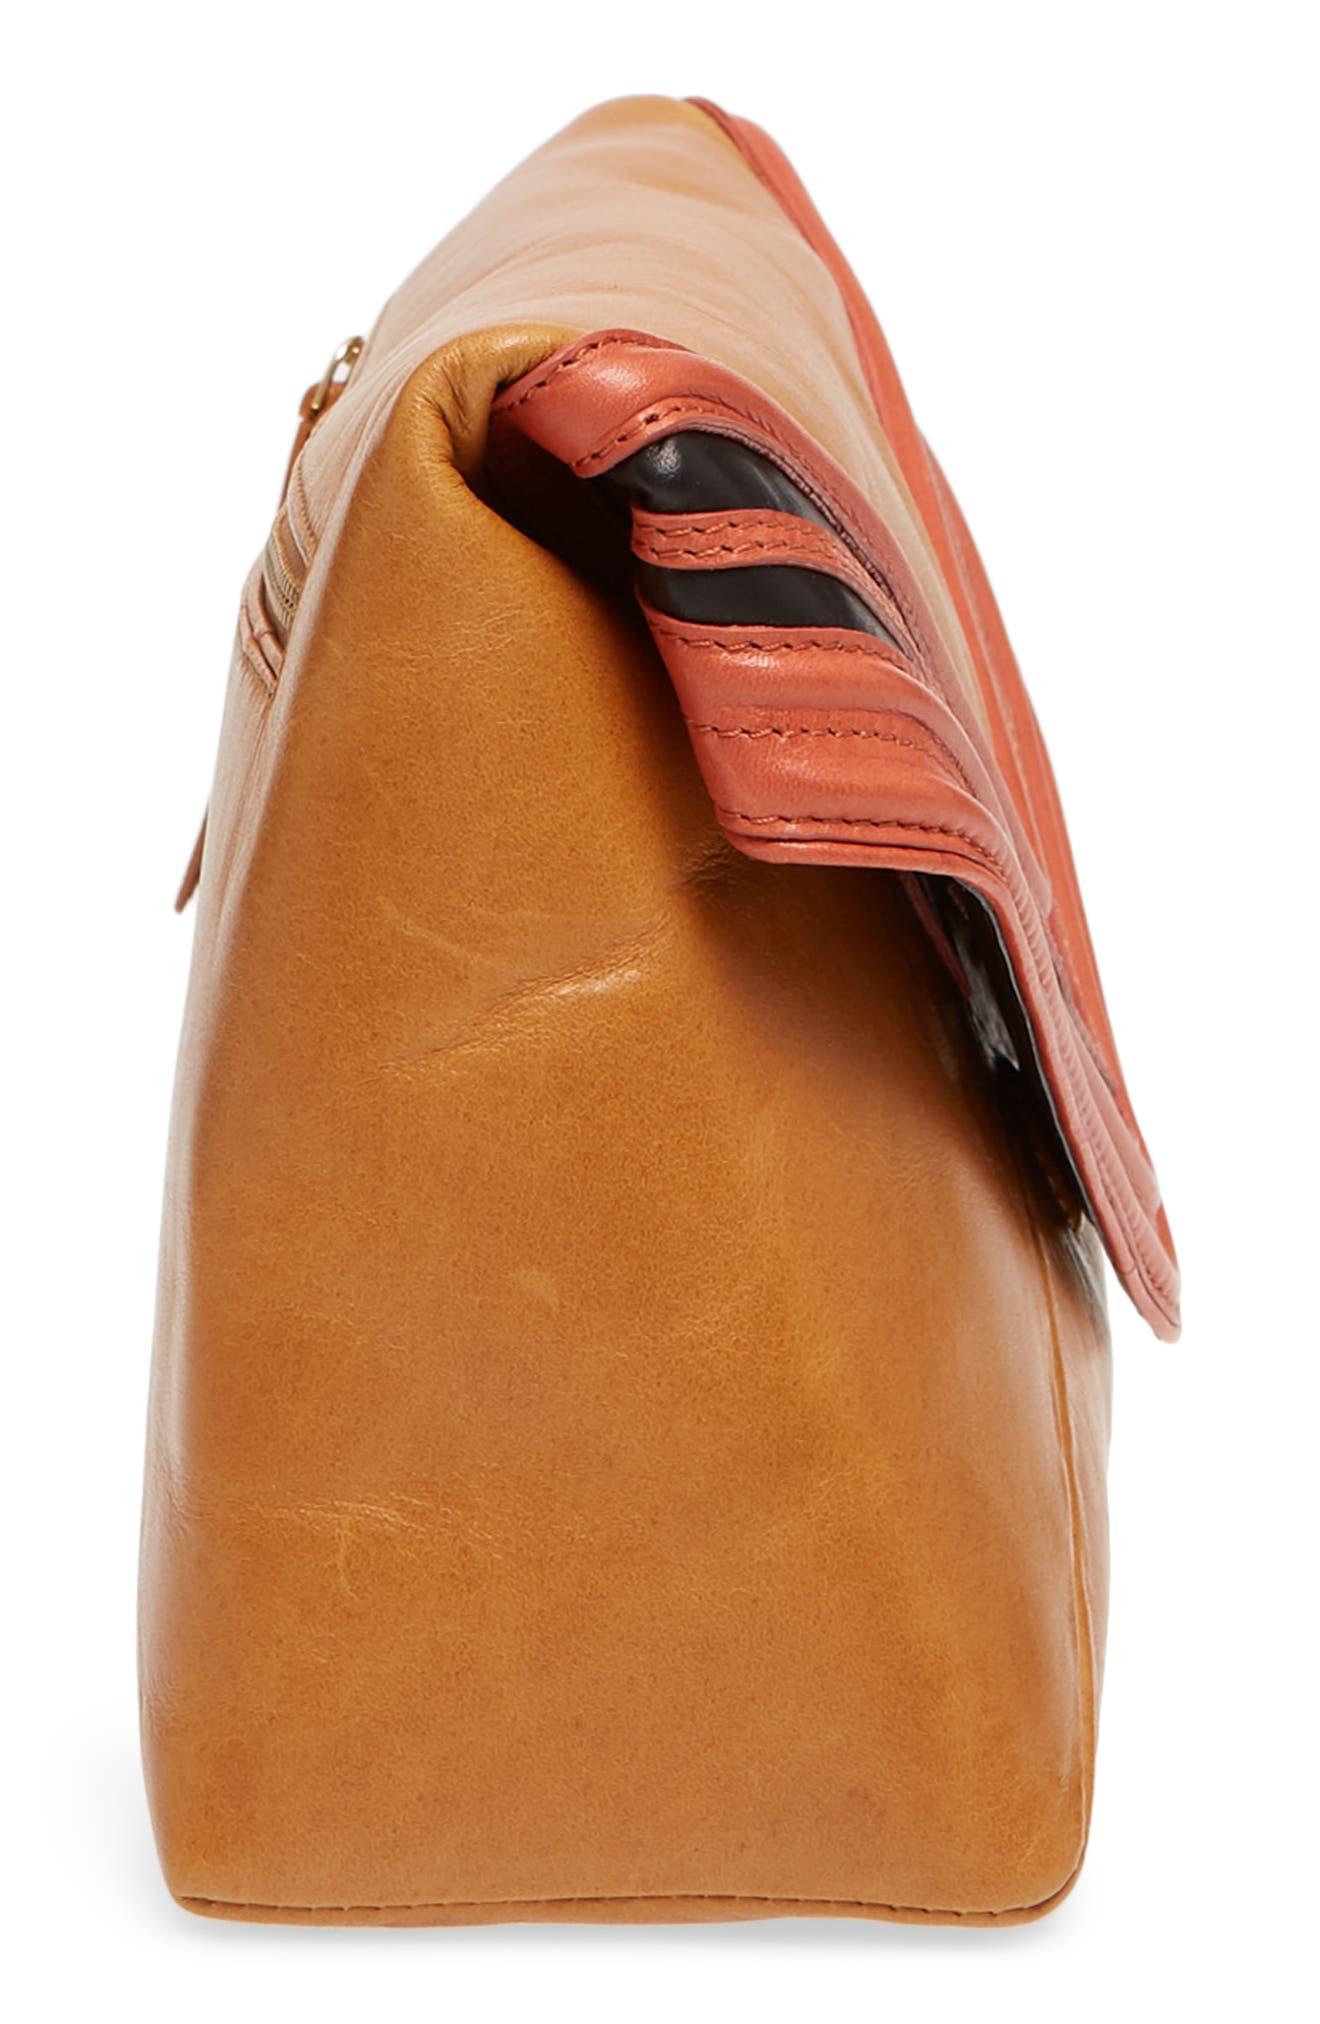 Leather Envelope Clutch,                             Alternate thumbnail 5, color,                             Camel